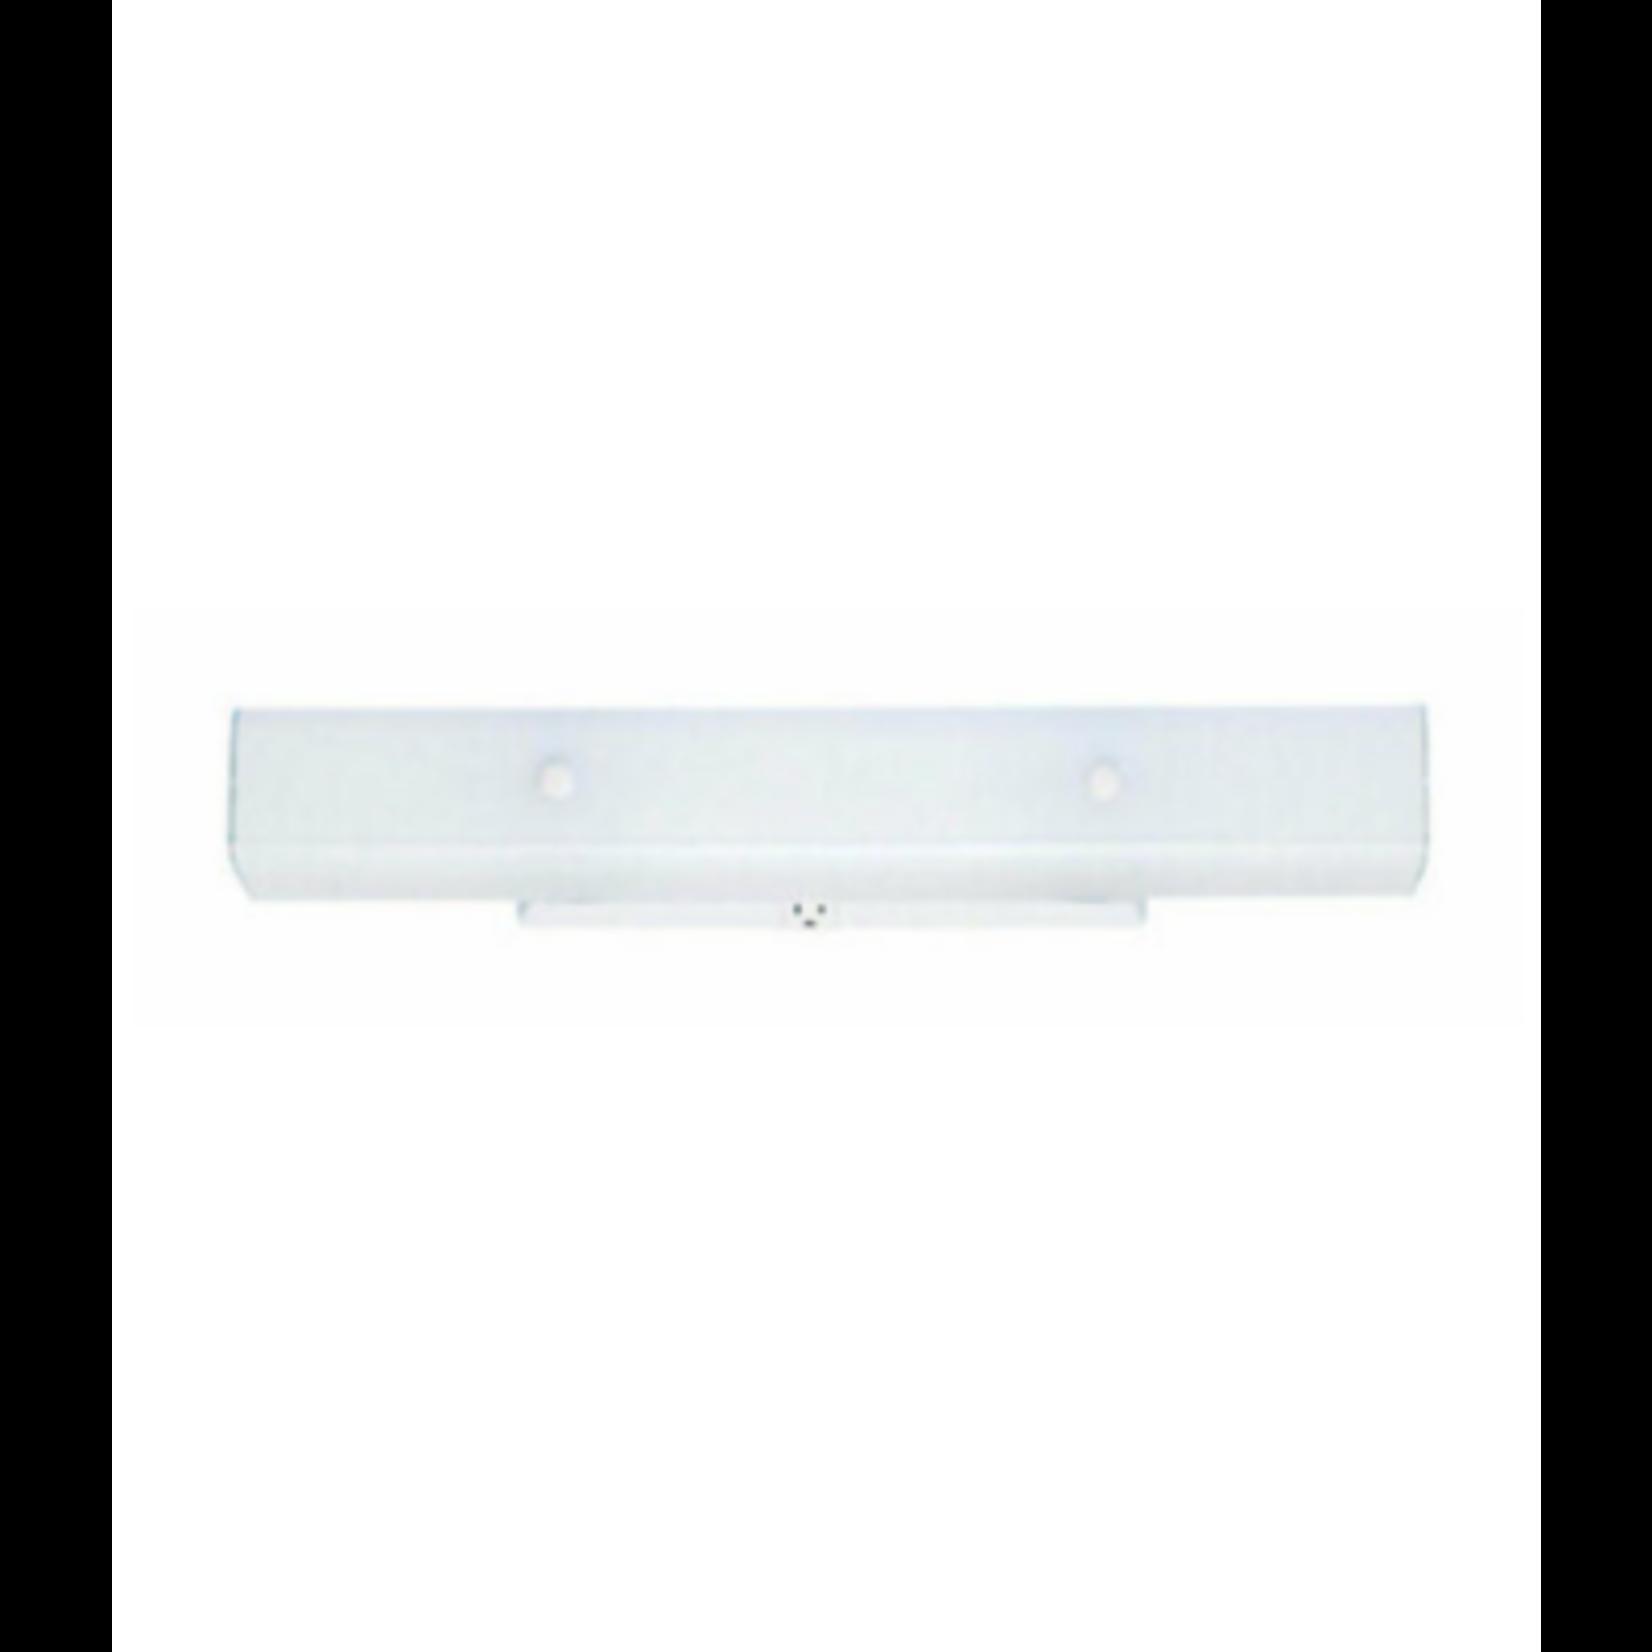 6629 WestingHouse 4 Lights Bathroom Channel Fixture Wall Mount